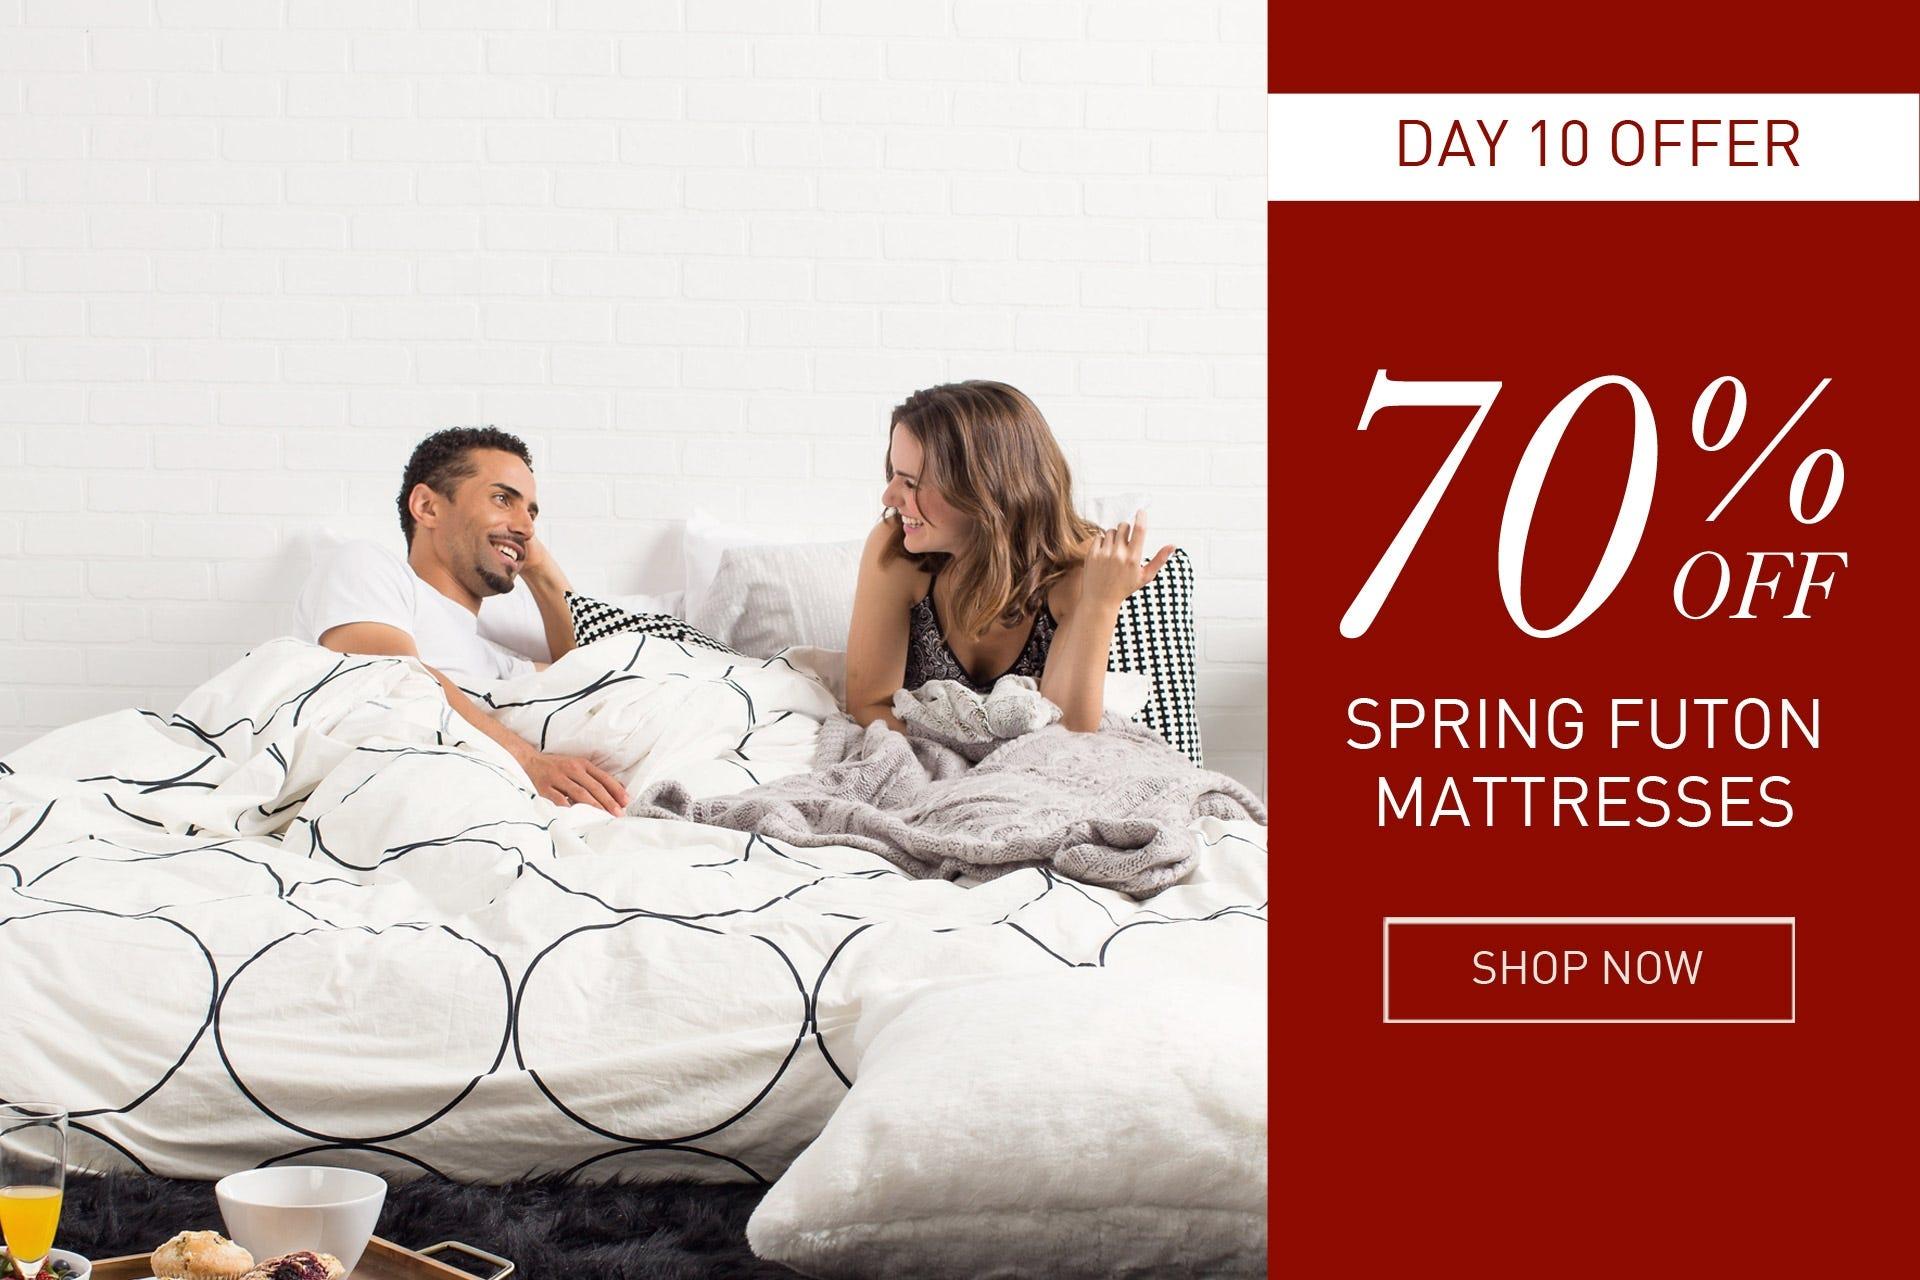 Spring futon mattresses